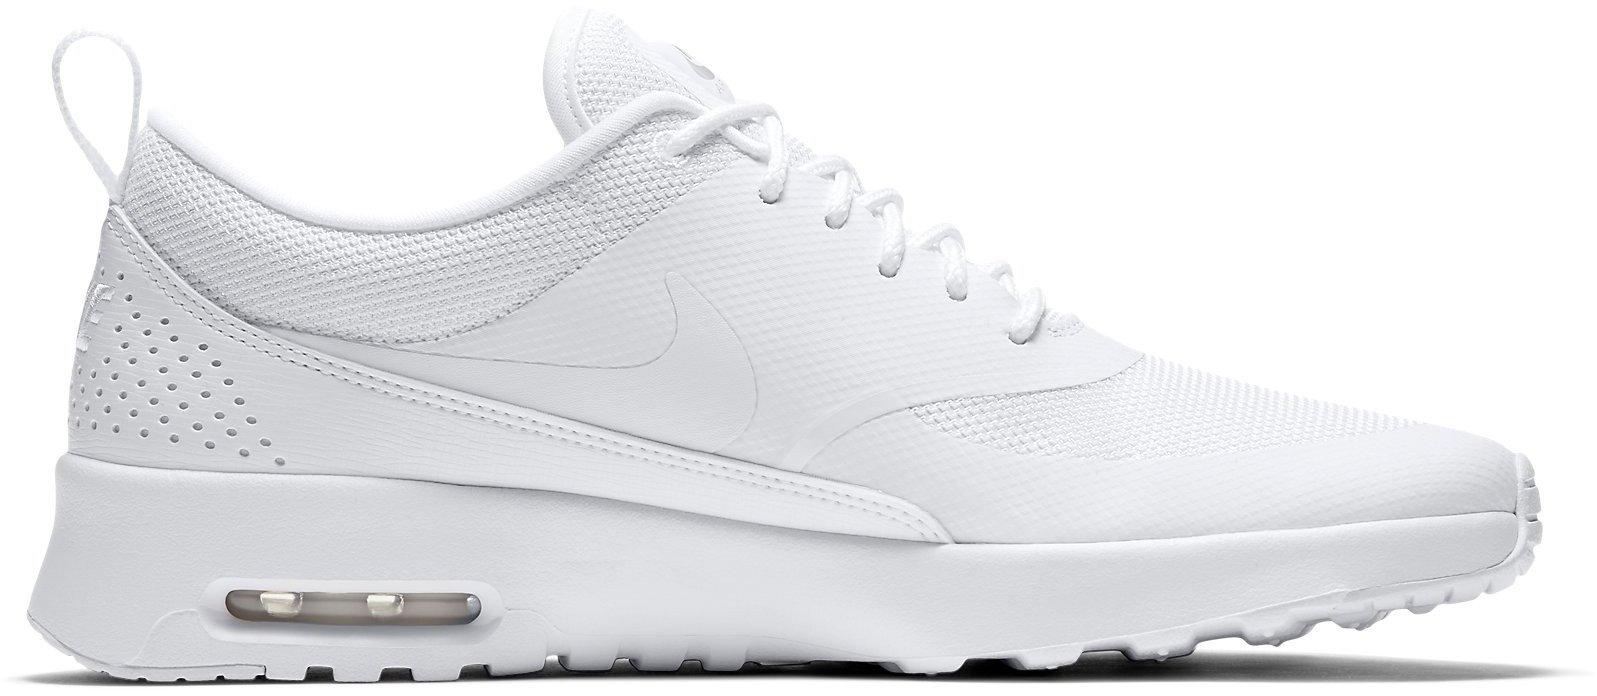 Shoes Nike WMNS AIR MAX THEA